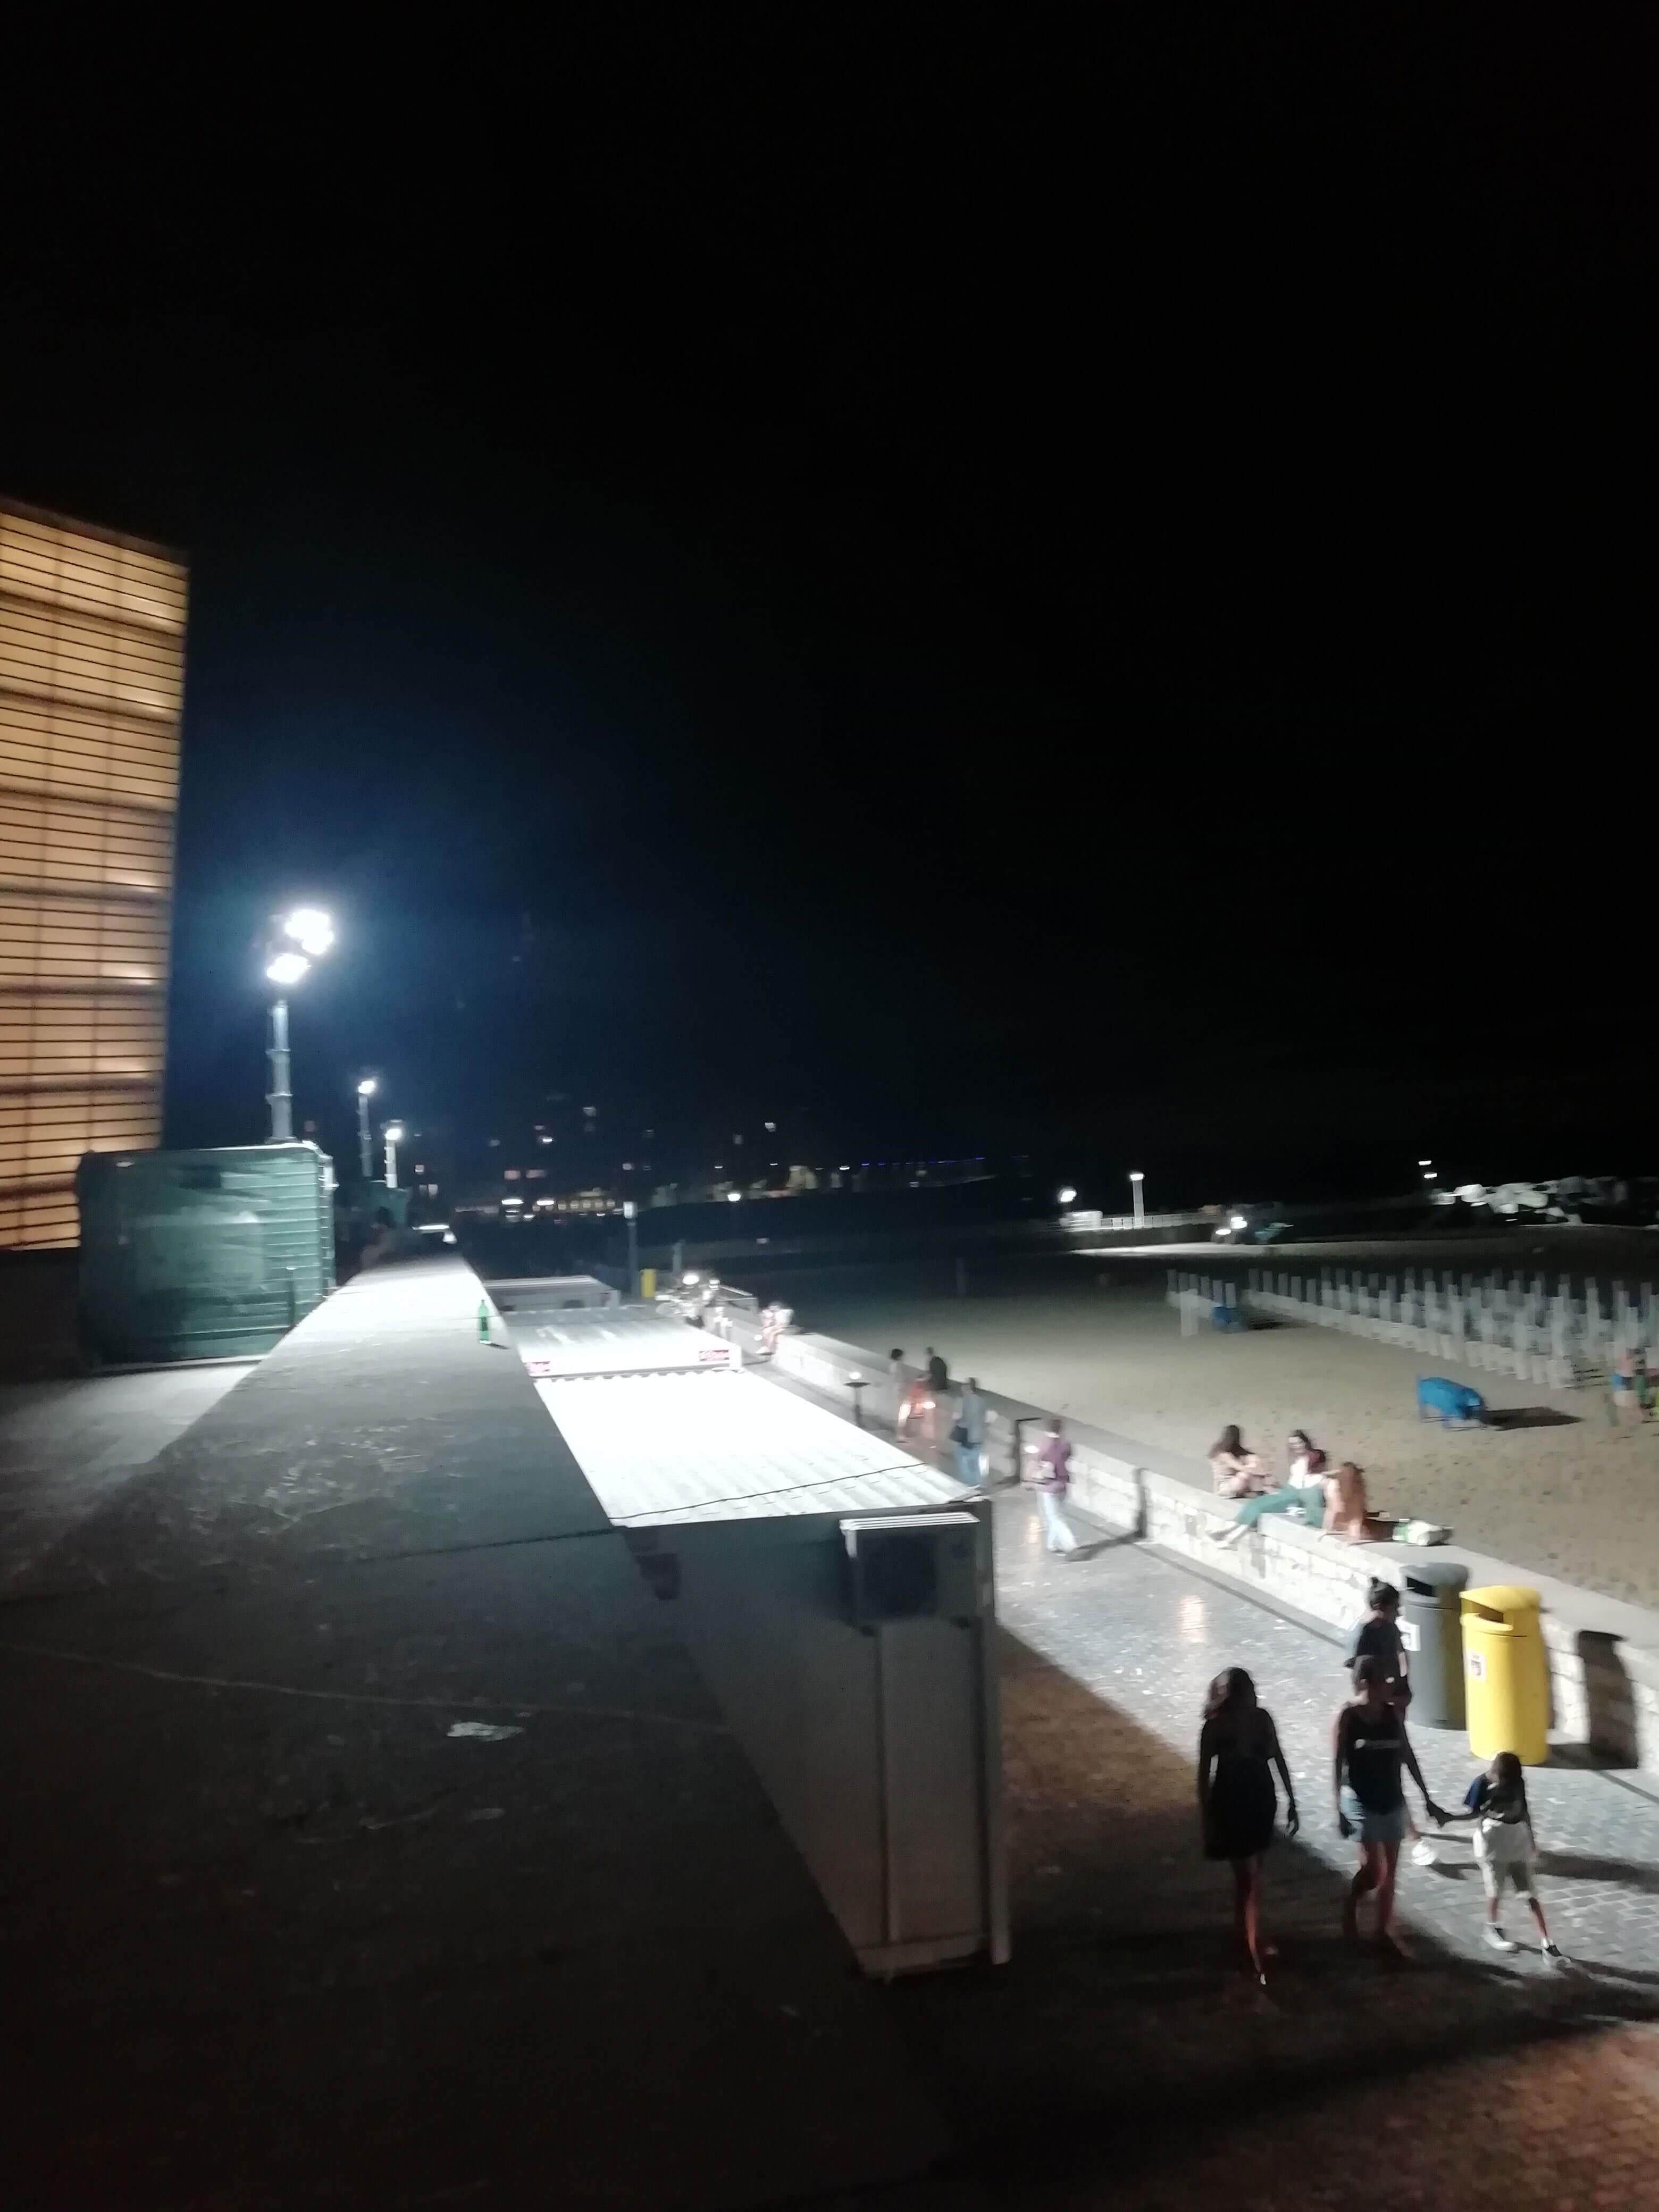 Torre de iluminación autónoma